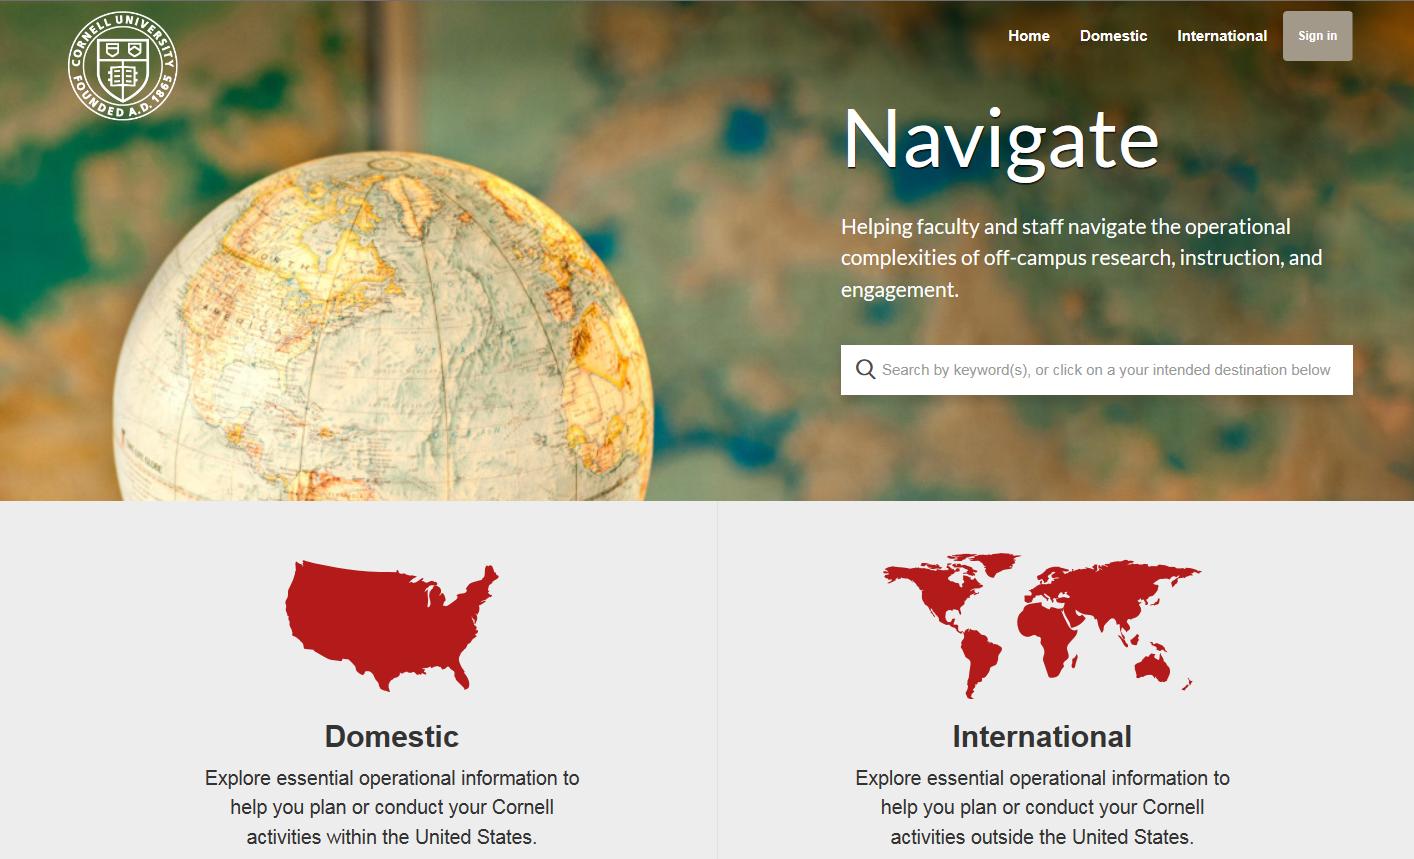 navigate.cornell.edu